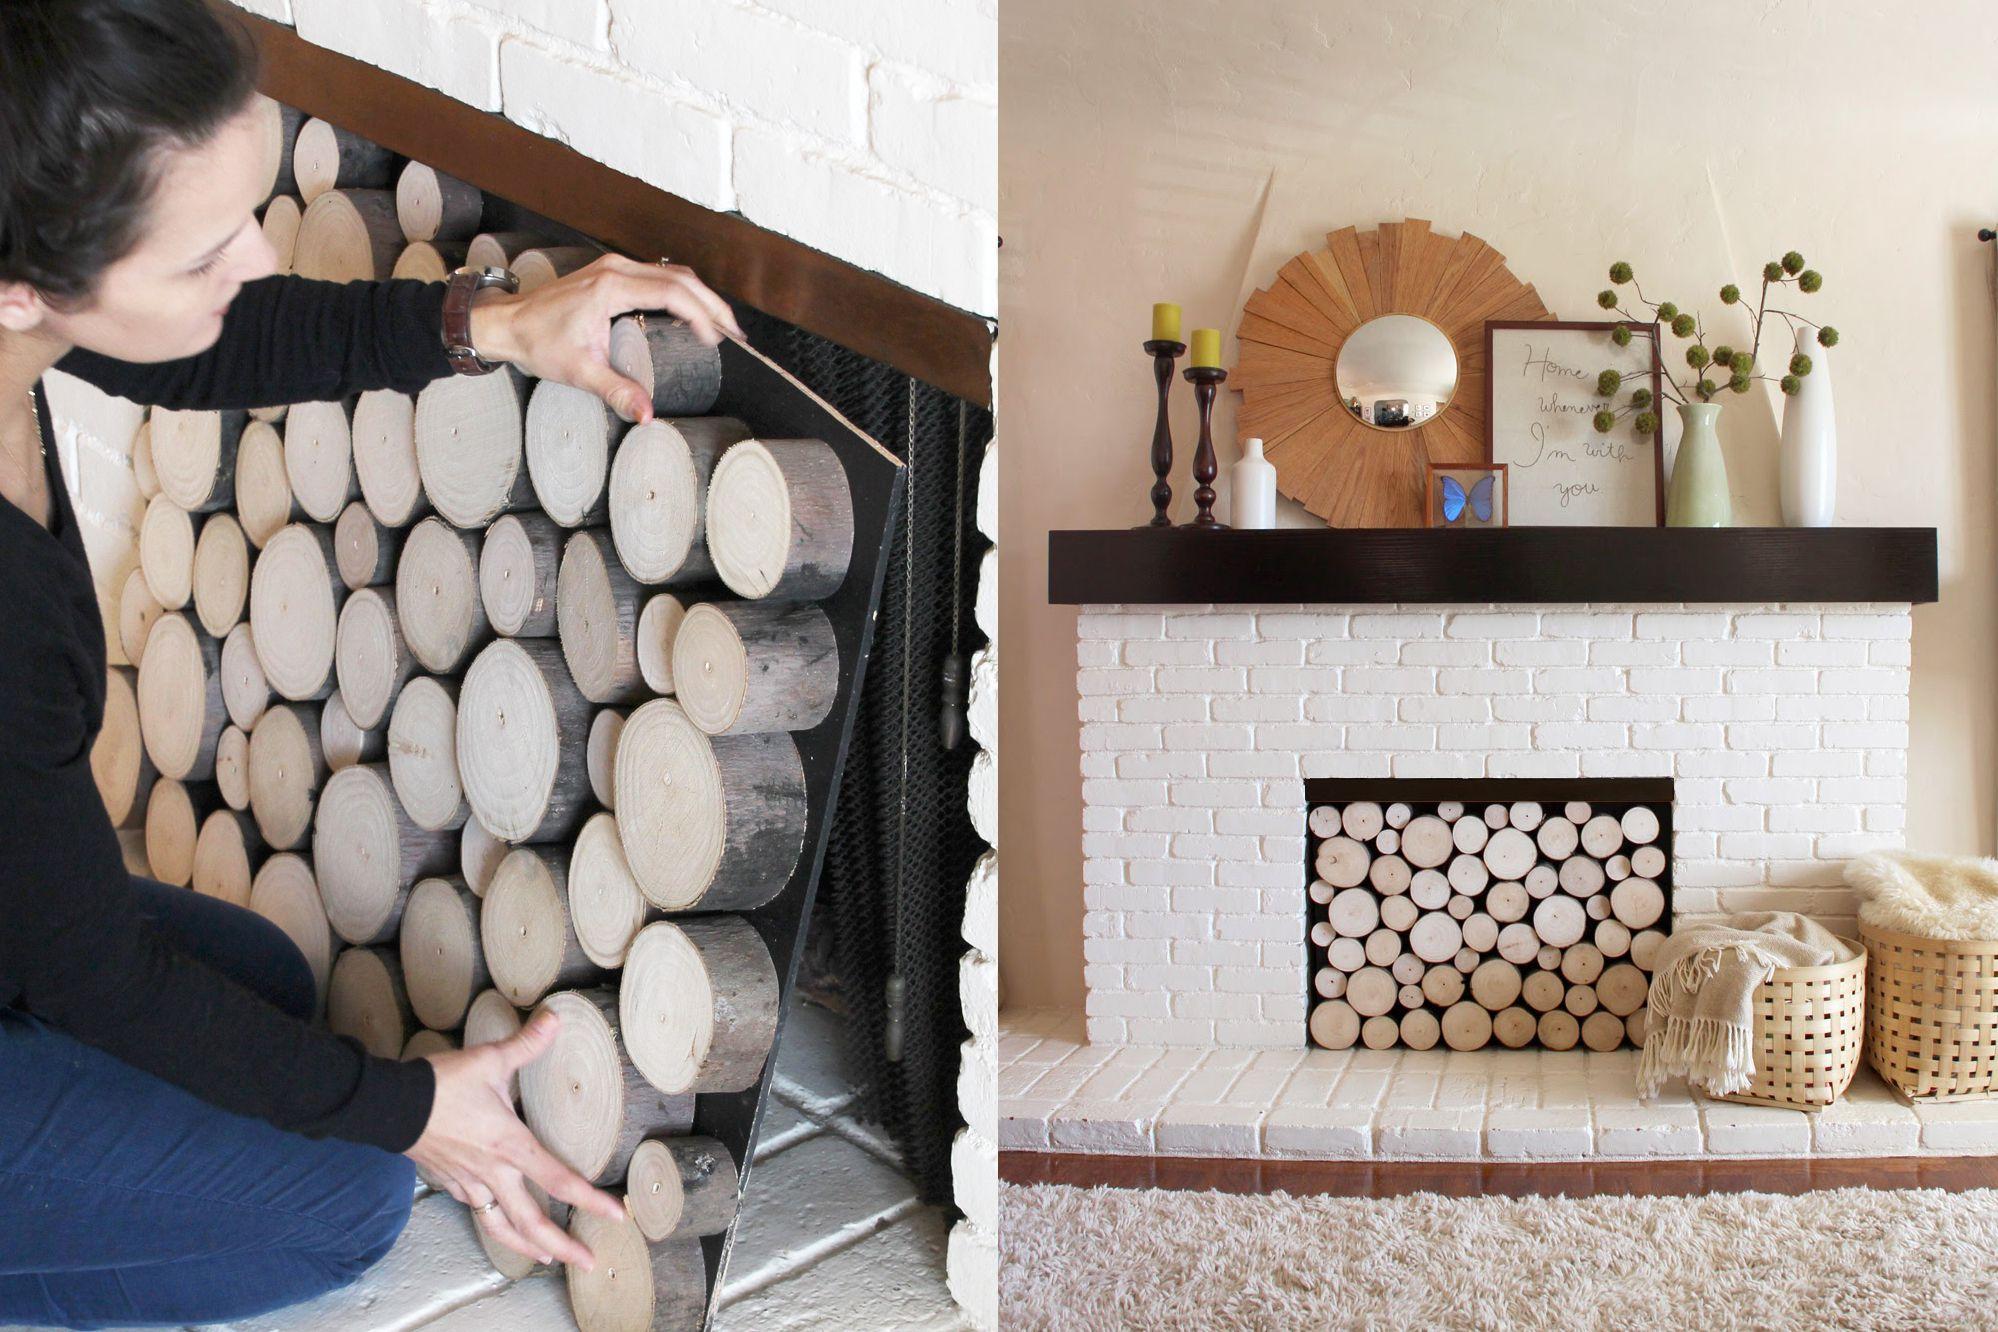 Fireplace Rounds DIY Fall Mantel 595fe6ad3df78cdc68b